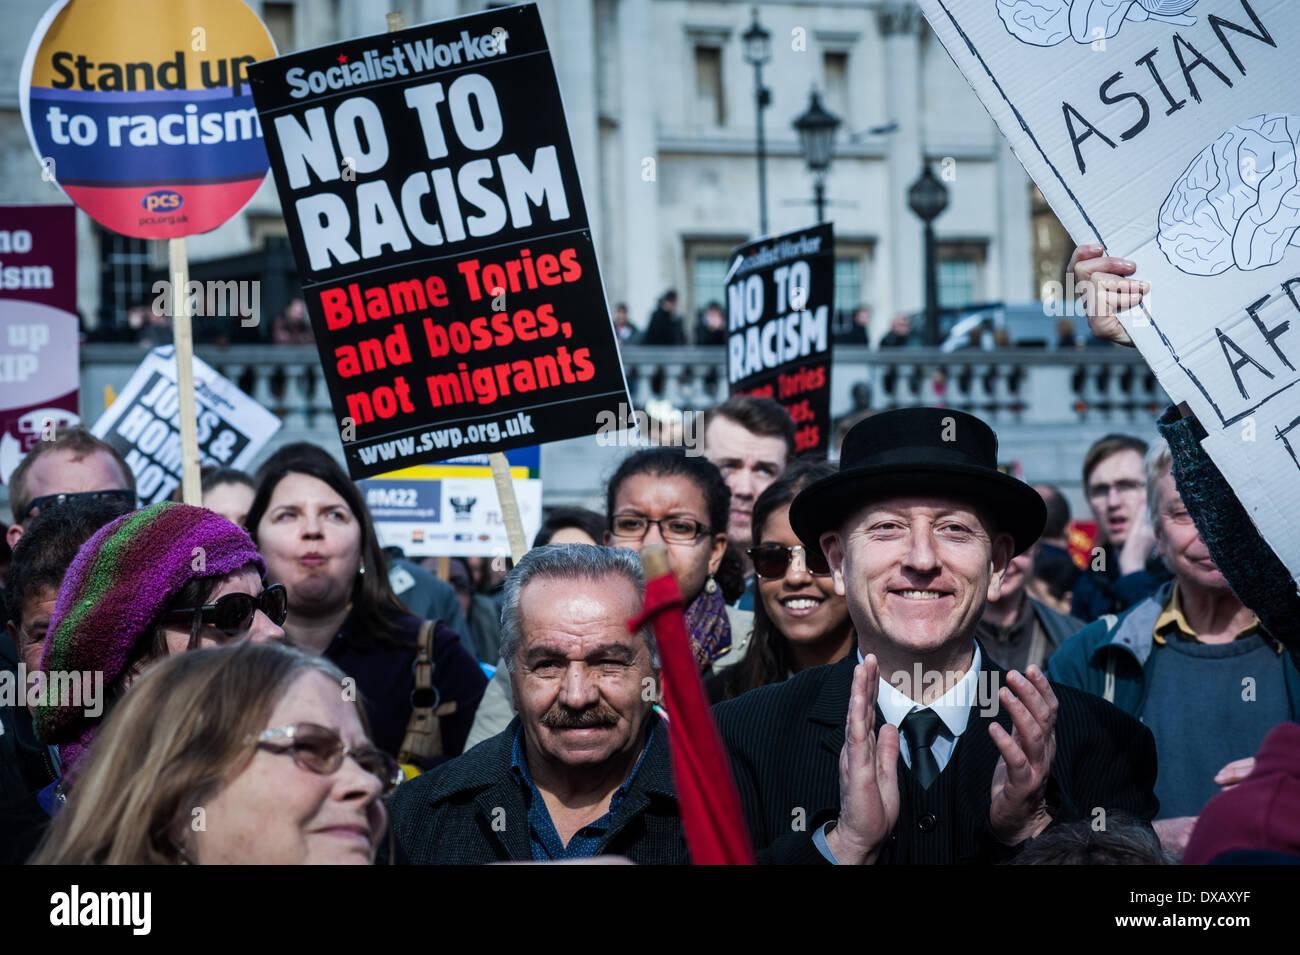 London, UK - 22 March 2014: marchers gather in London to celebrate the United Nations International Anti-Racism Day. Credit:  Piero Cruciatti/Alamy Live News - Stock Image